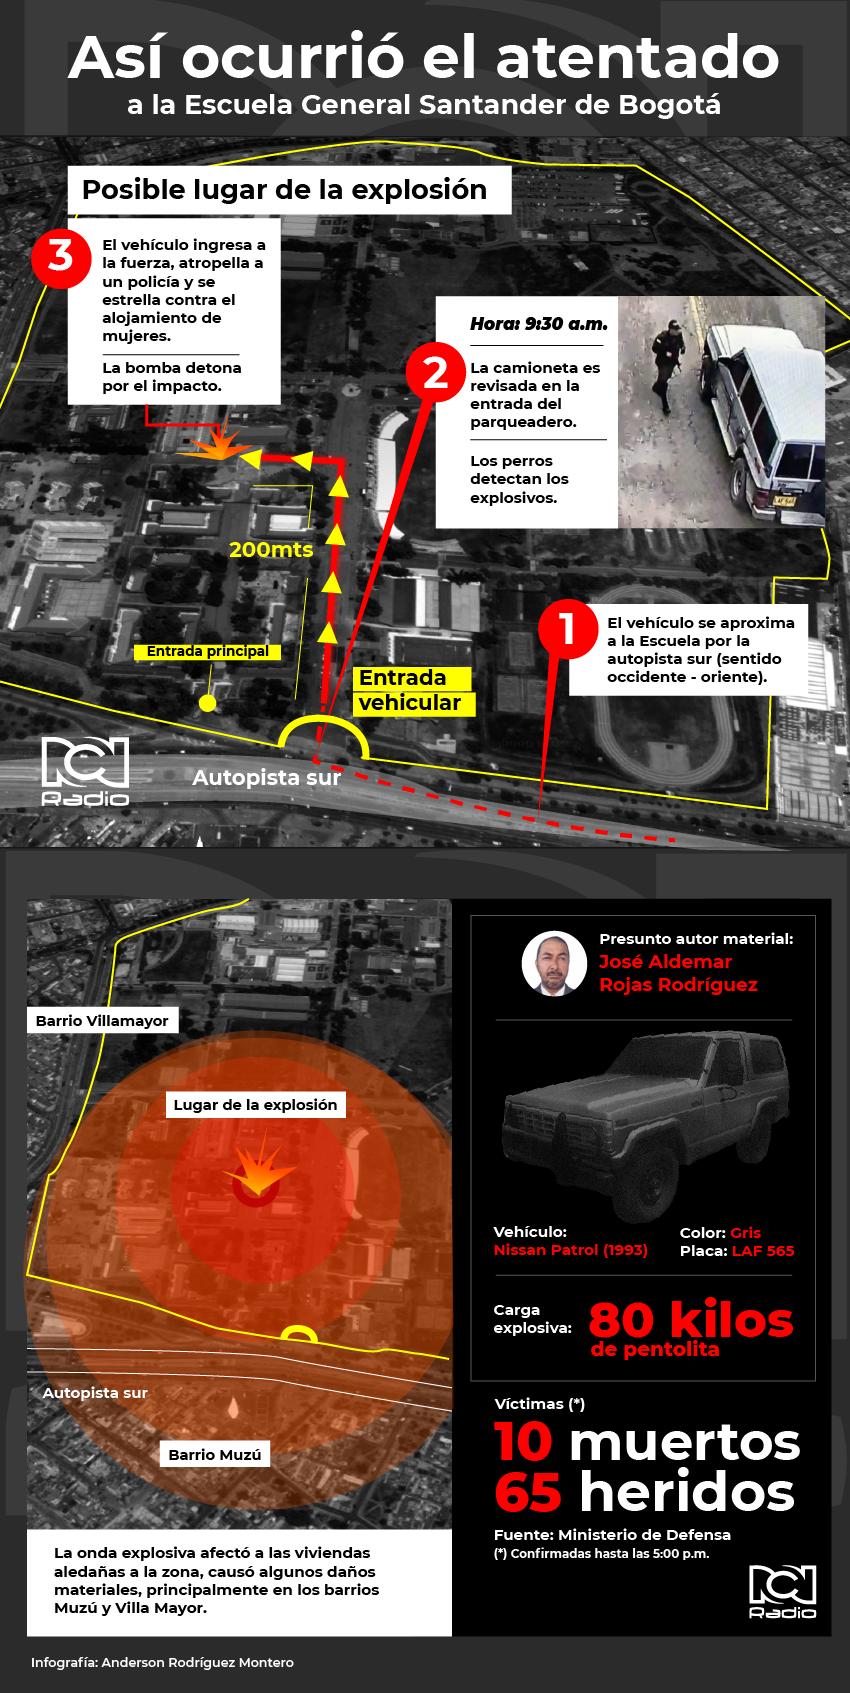 Infografía carrobomba en Bogotá enero 17 de 2019